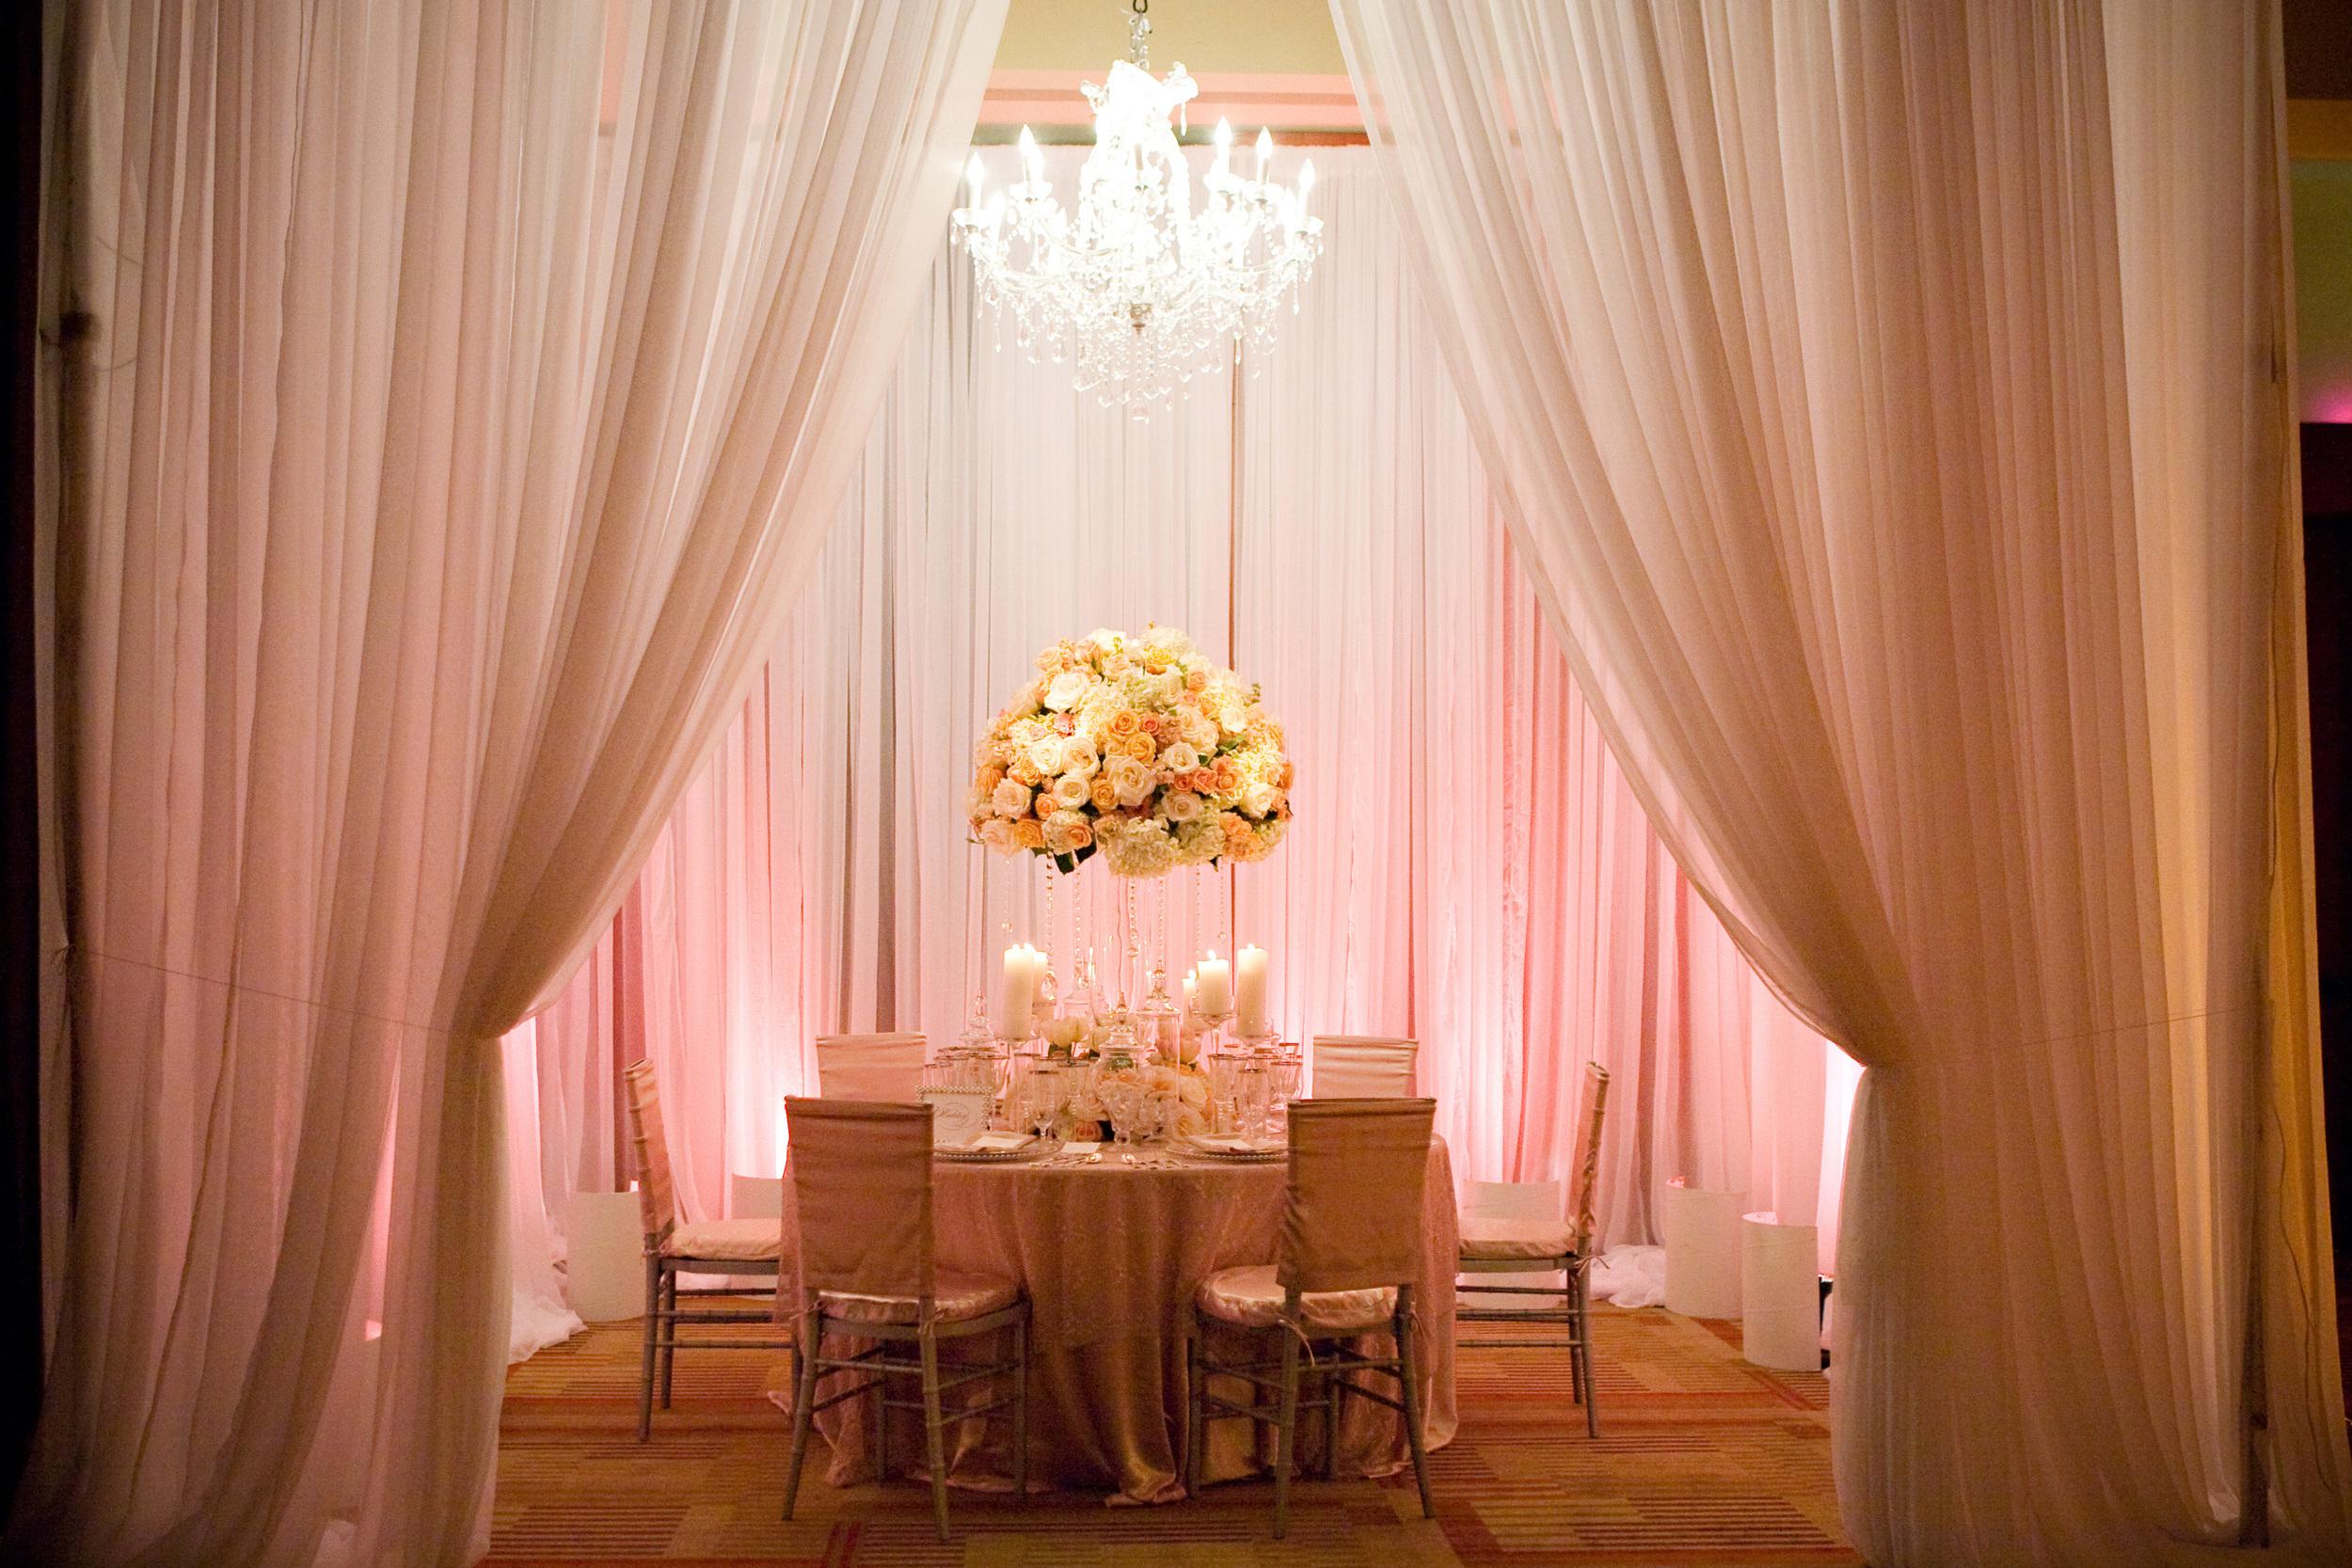 4 Seasons Palo Alto Wedding